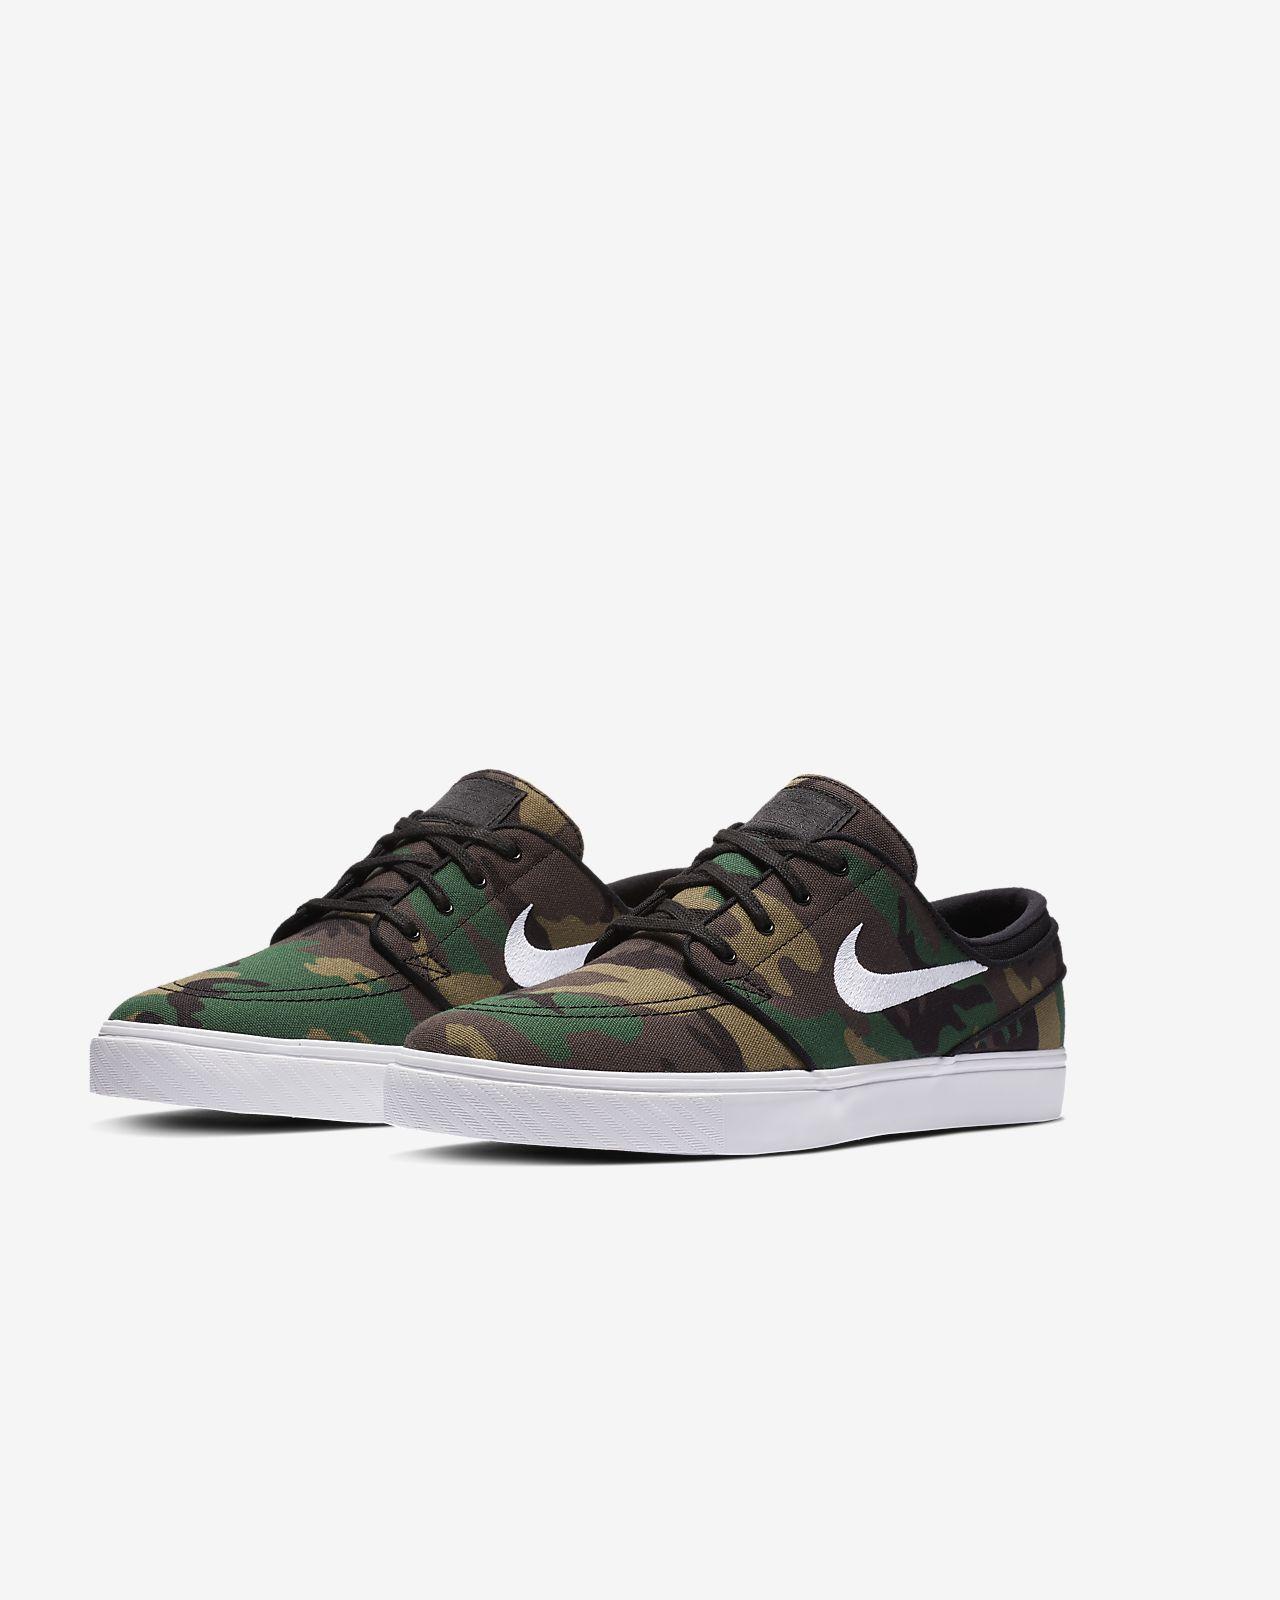 buy online 1d32c b3d17 ... Nike SB Zoom Stefan Janoski Canvas Men s Skate Shoe